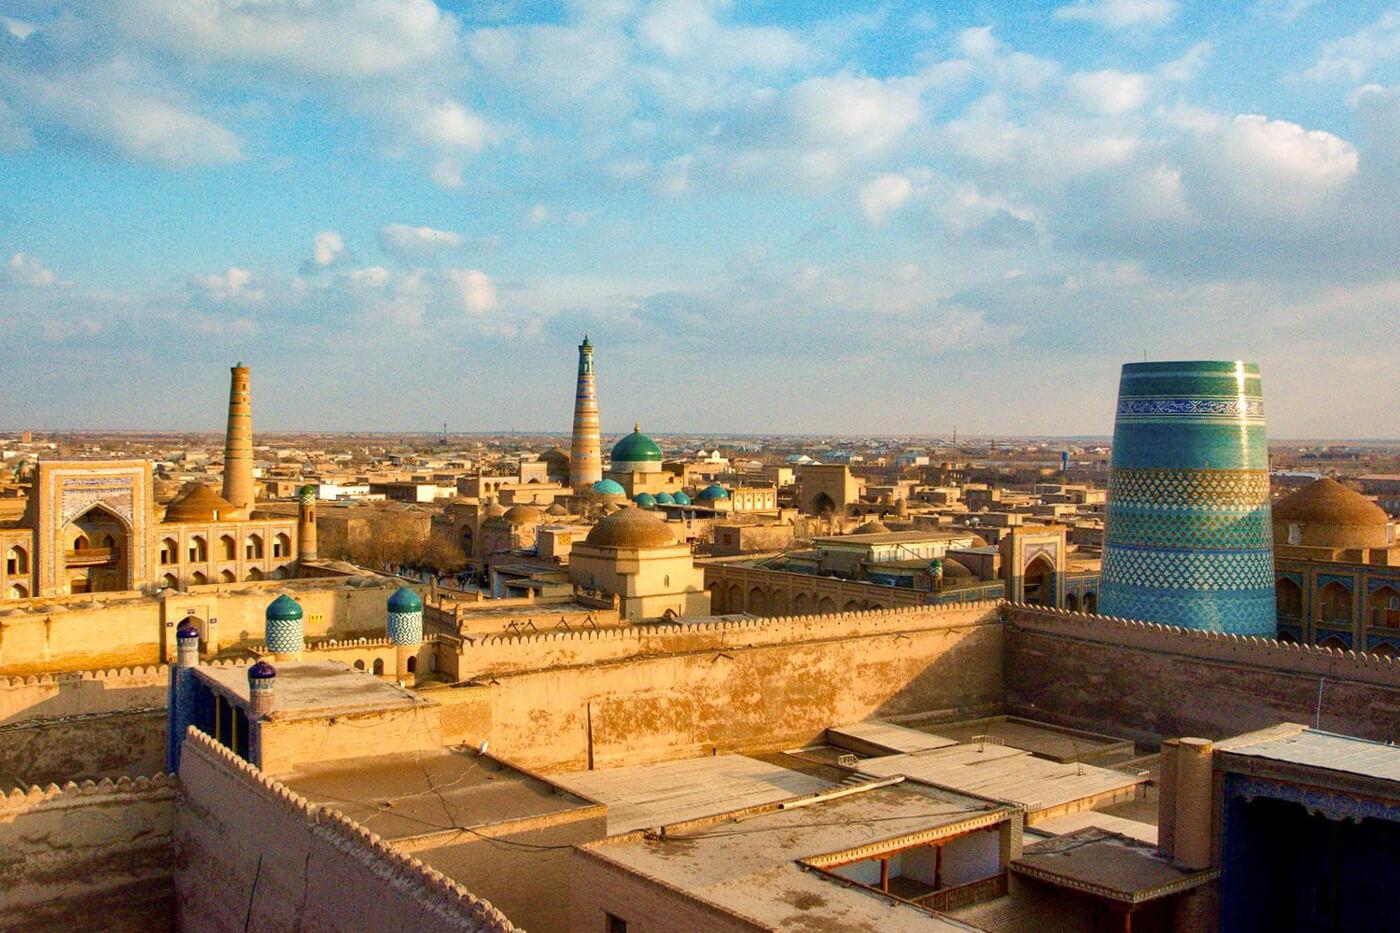 Silk Road city Khiva in Uzbekistan